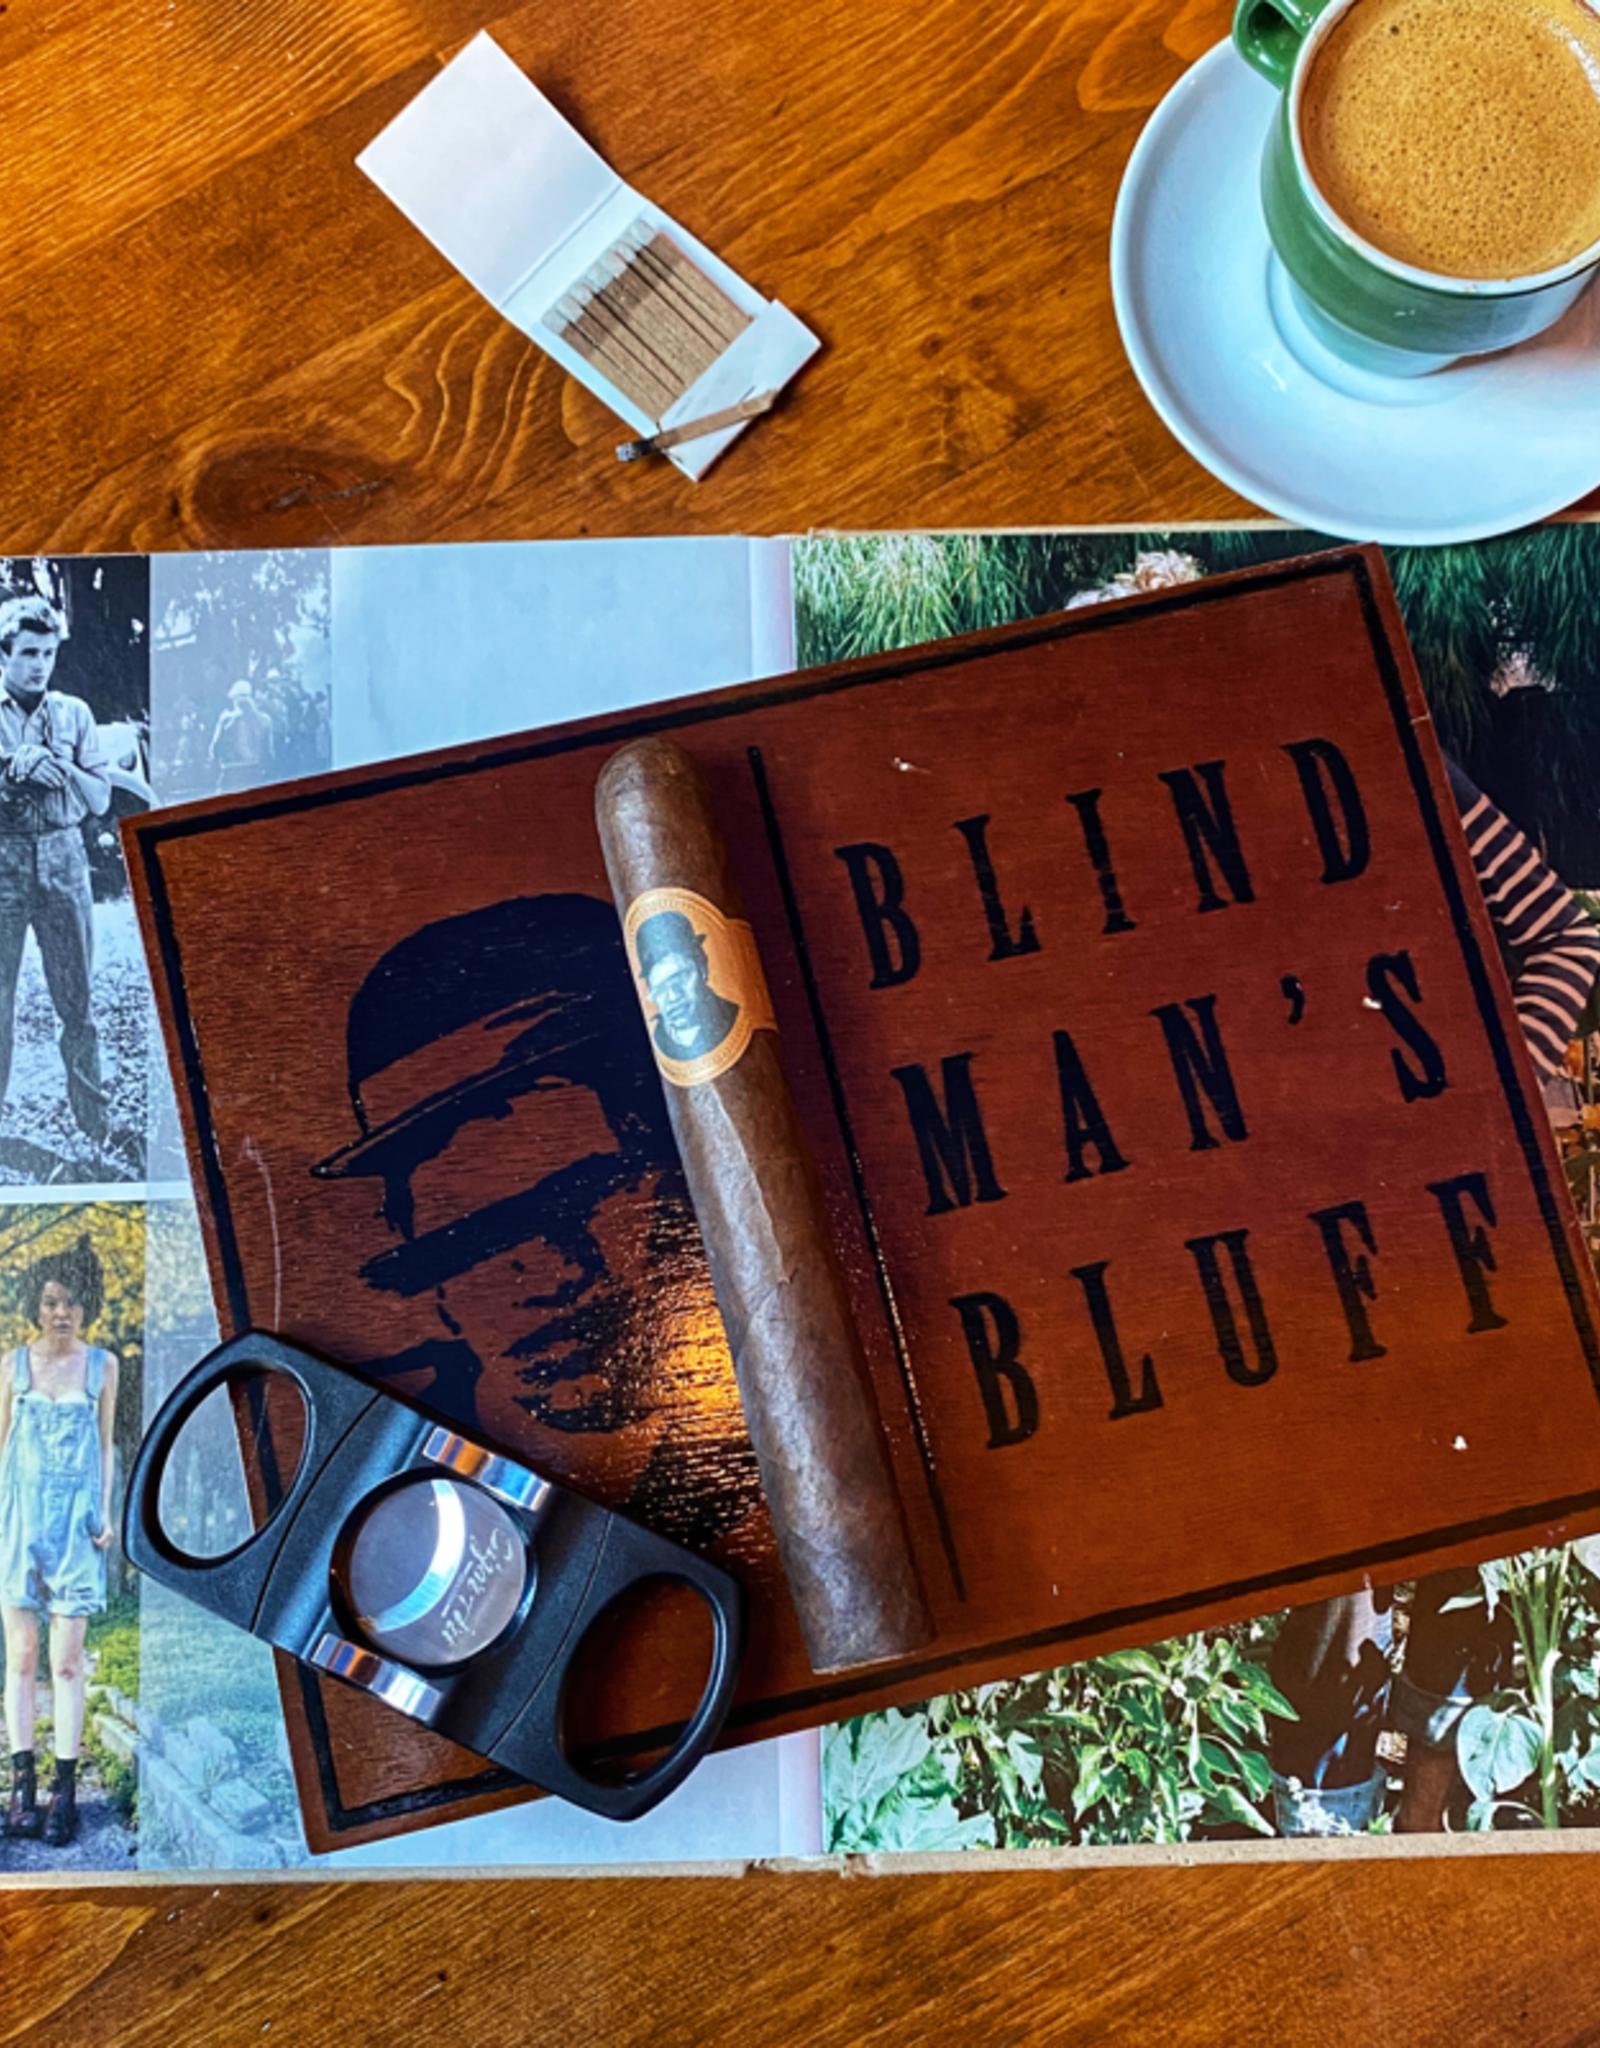 Caldwell Cigar Co Caldwell Blind Man's Bluff Habano Magnum 6 x 60 Five Pack